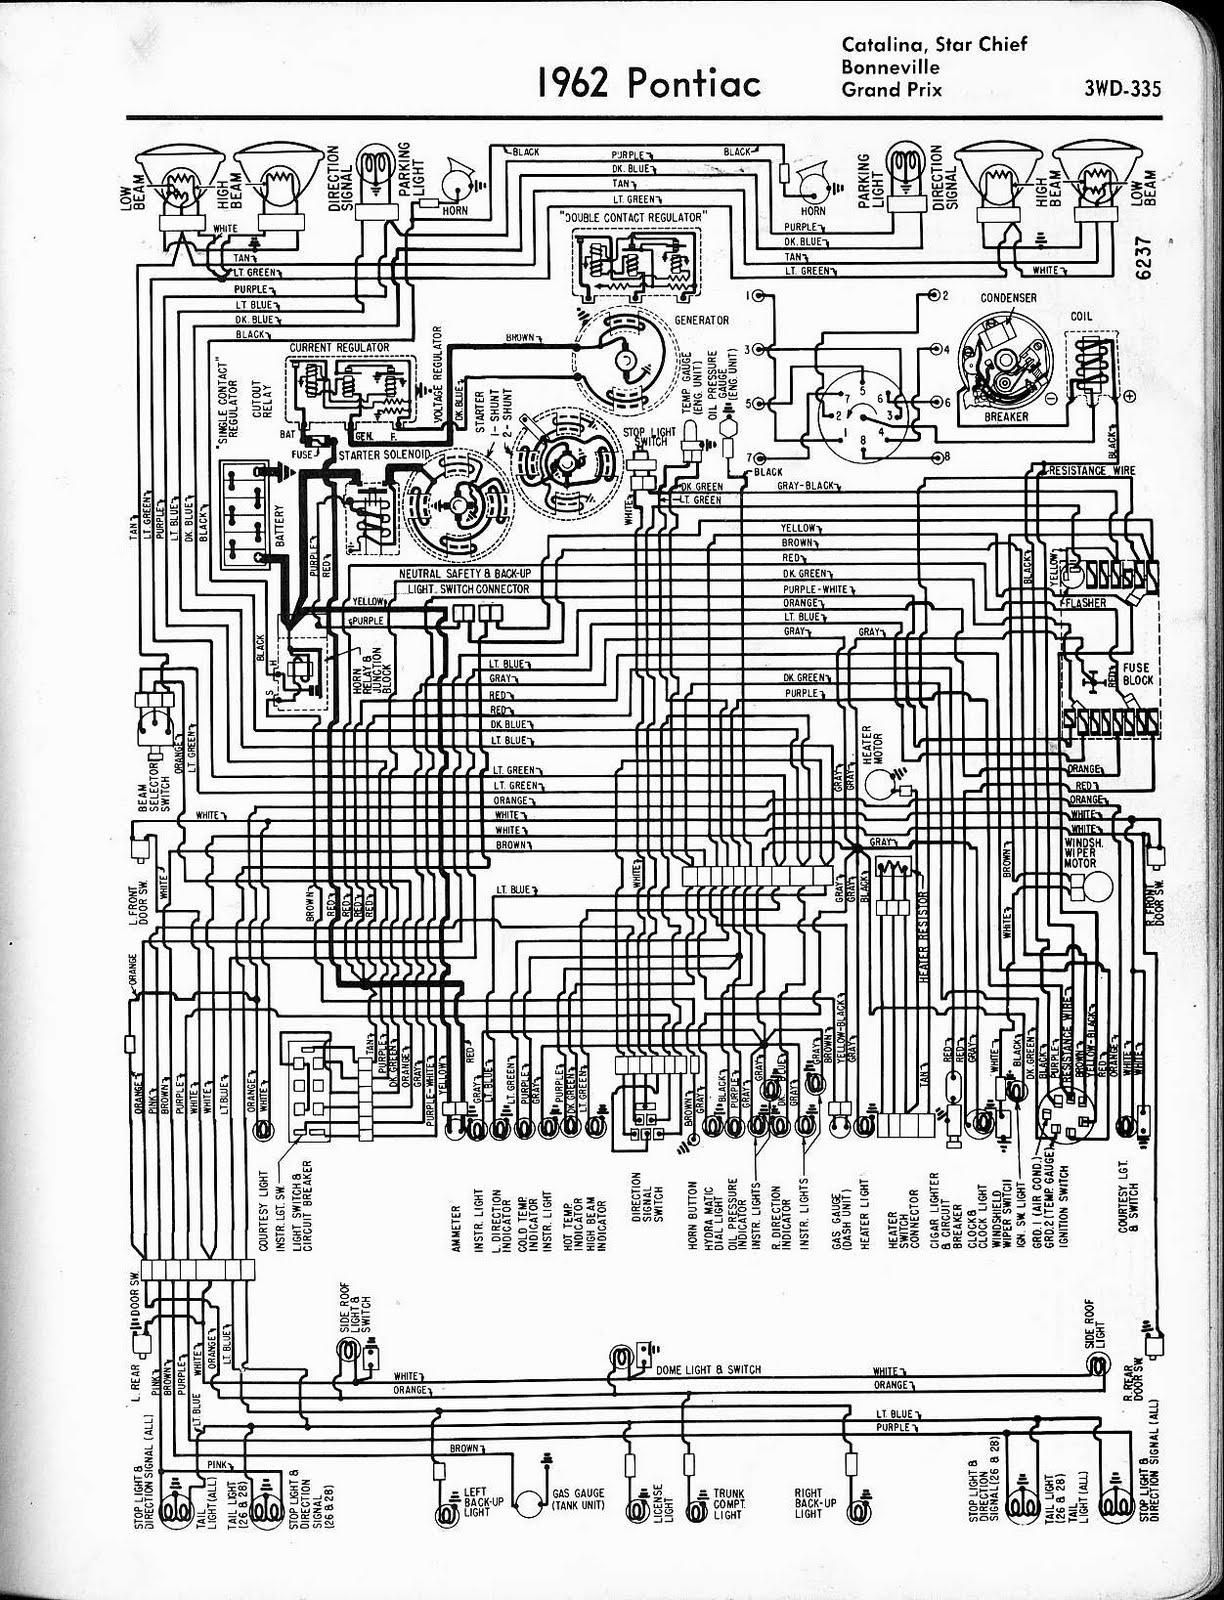 Free Auto Wiring Diagram: 1962 Pontiac Catalina, Star Chief, Bonneville, Grand Prix Wiring